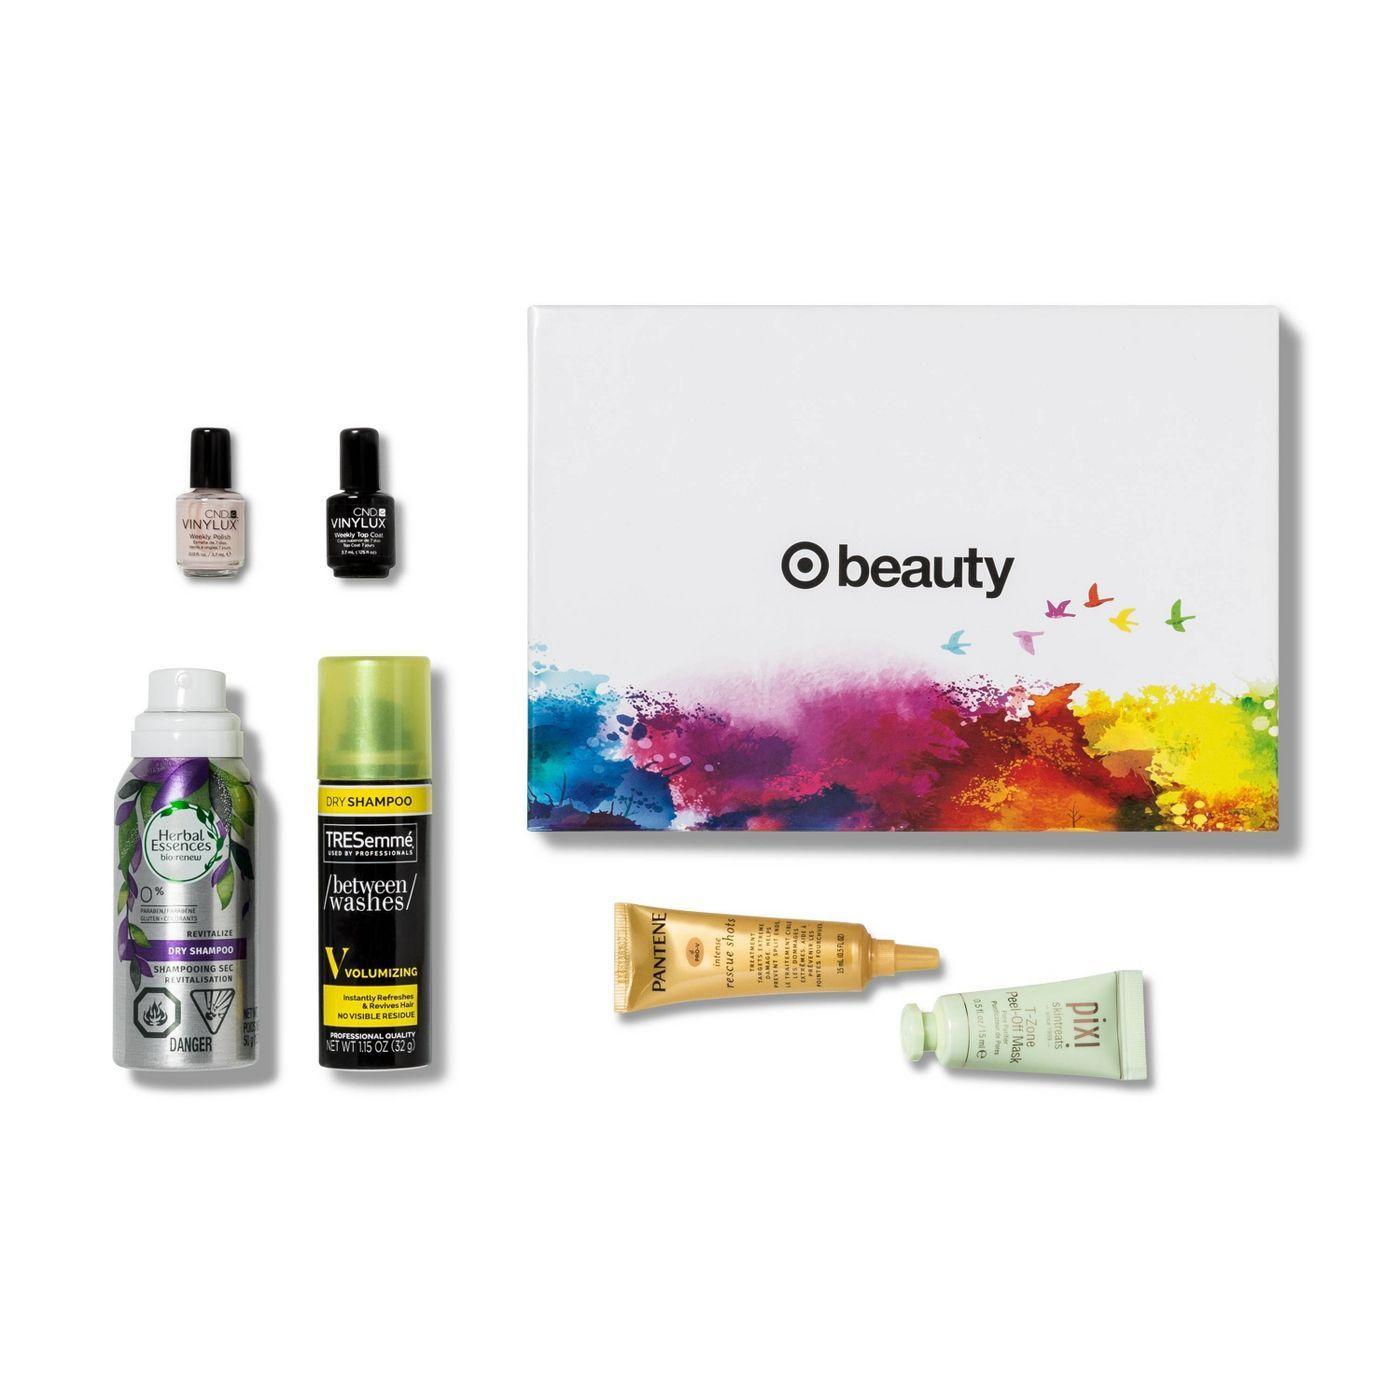 17 target beauty Box ideas